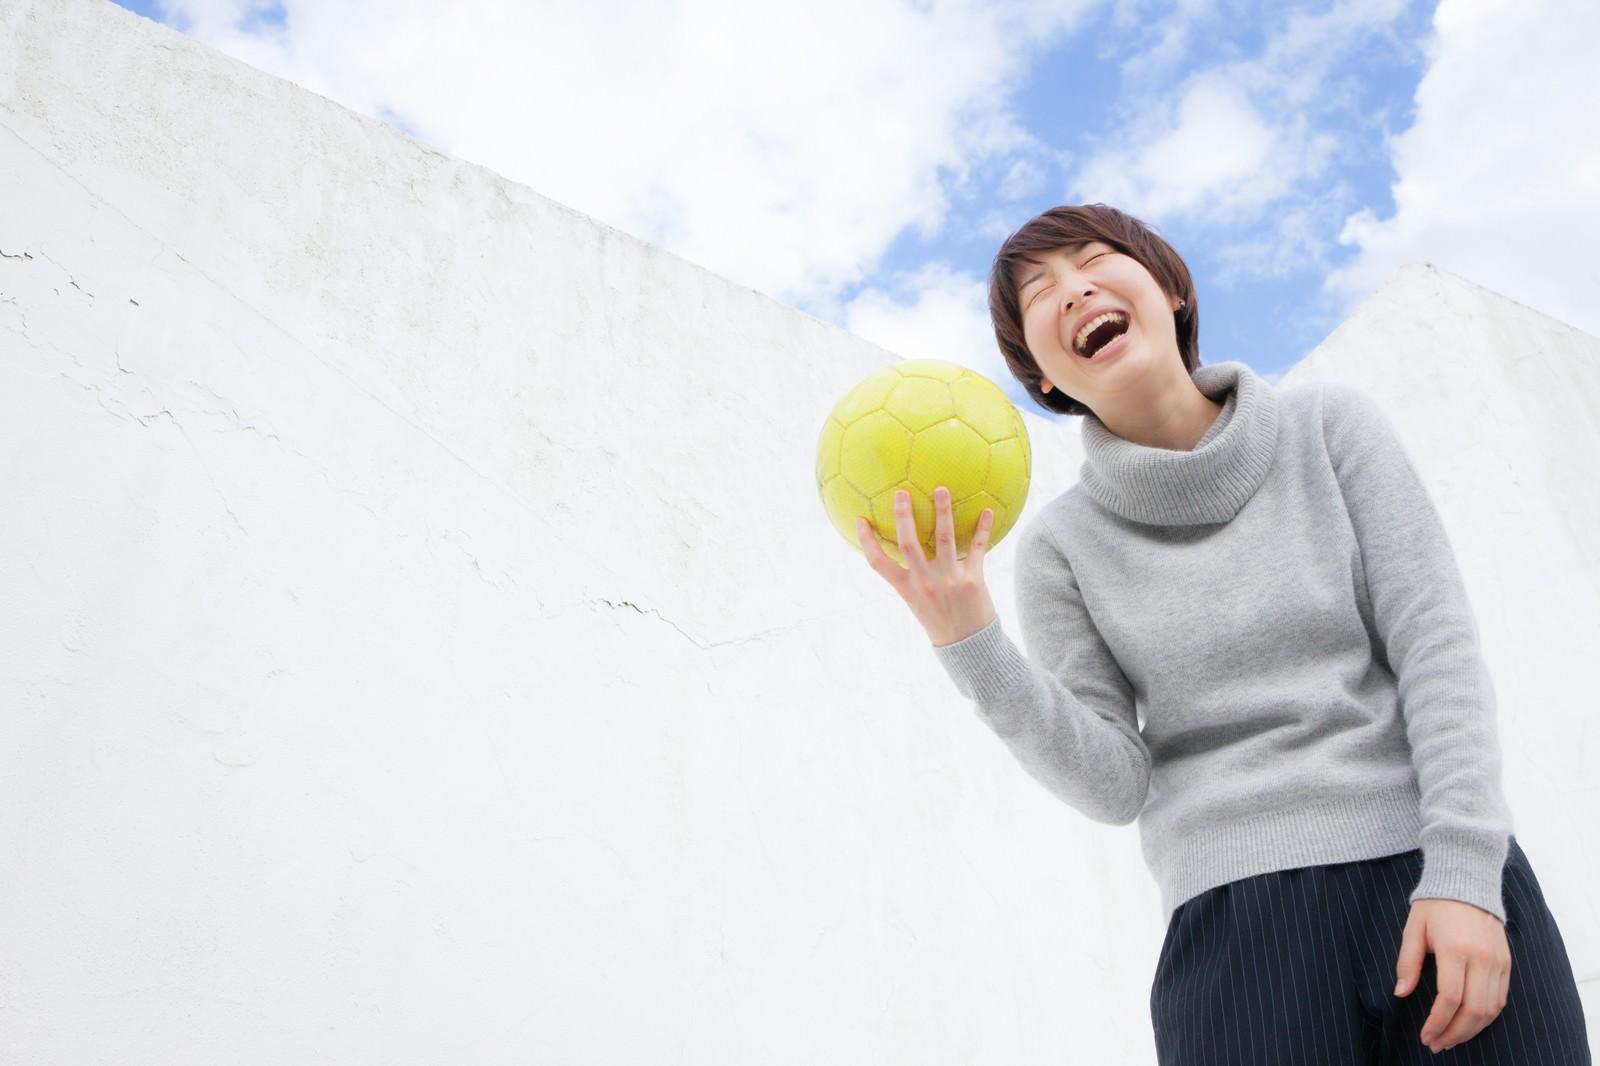 「U-17日本女子代表候補だったなんて過去の話ですよ(ゲラゲラ)」の写真[モデル:八木彩香]